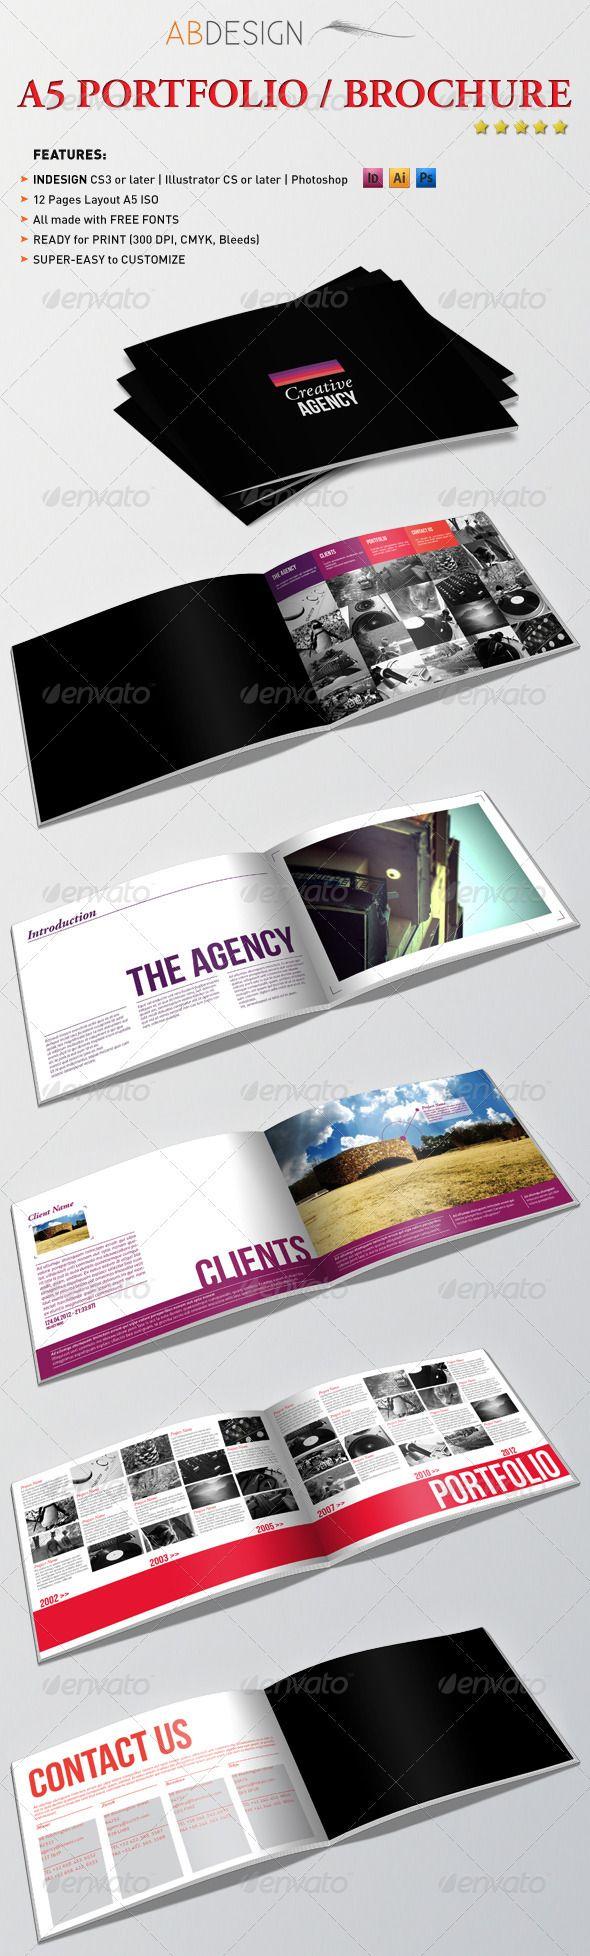 printable portfolio template thevillas co